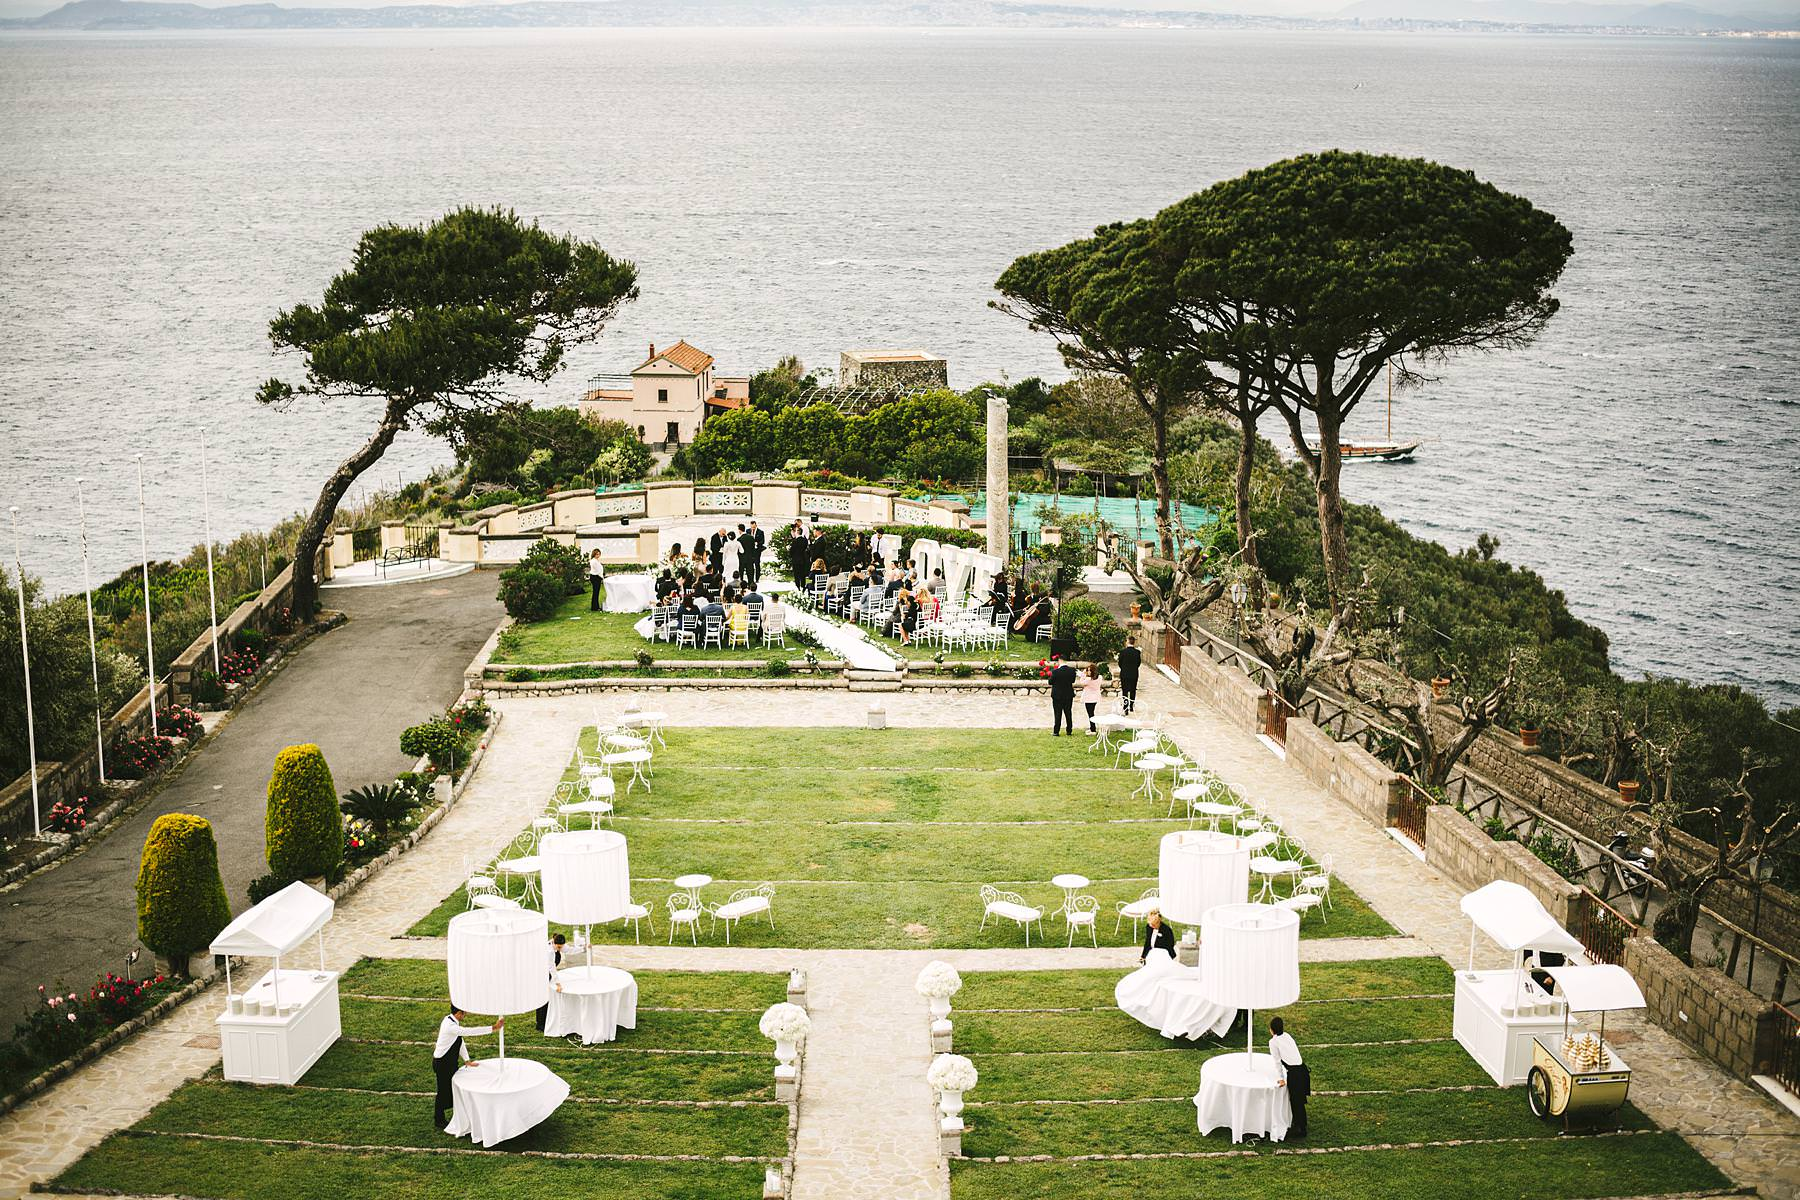 Amazing outdoor emotional and elegant destination wedding ceremony in Sorrento at Villa Angelina terrace